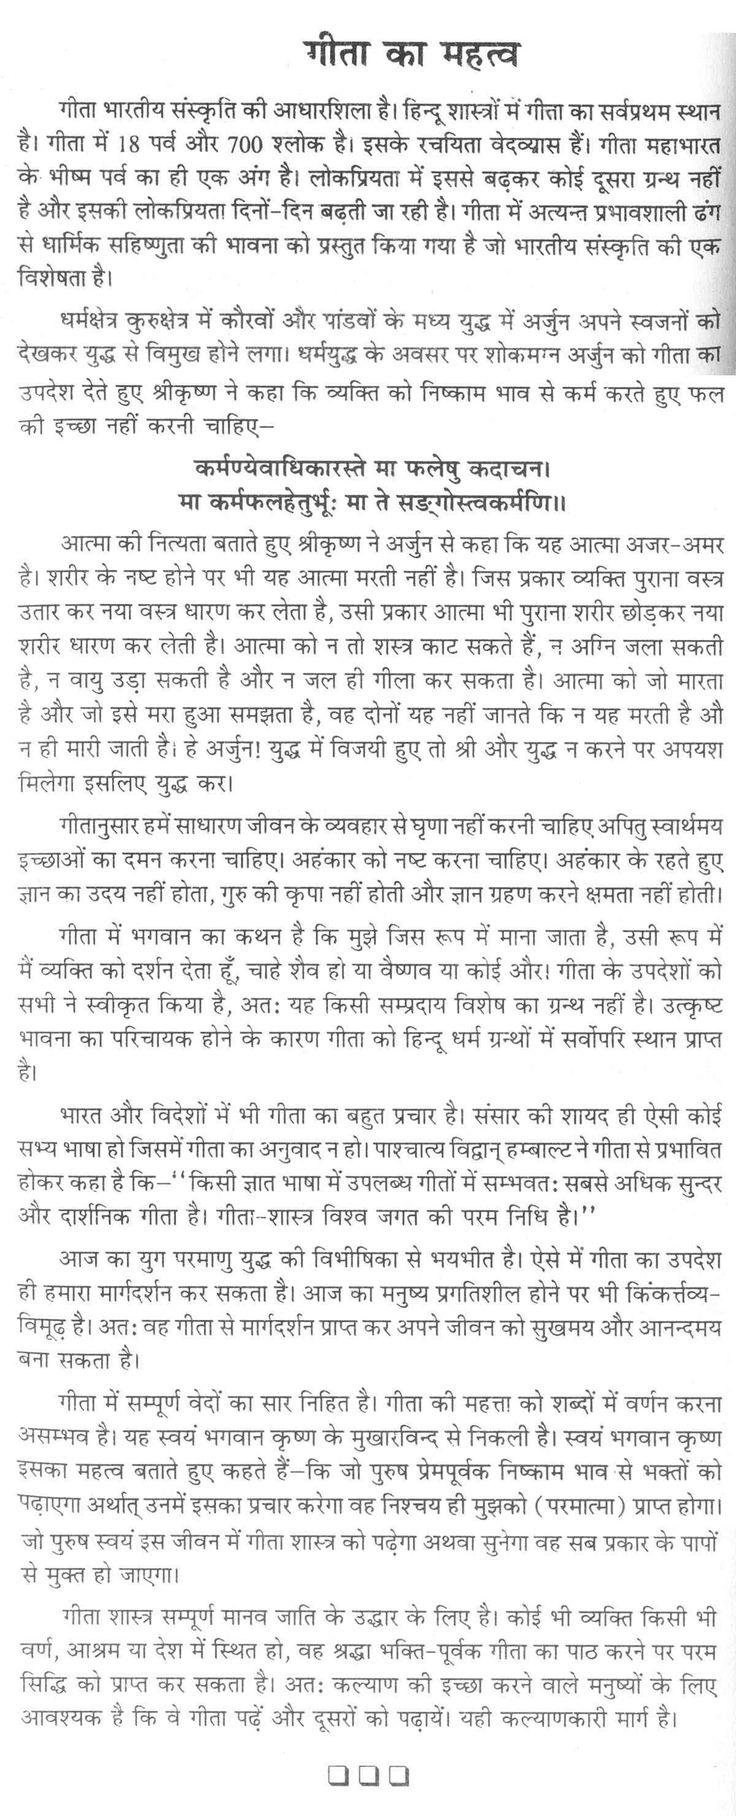 005 Trust Essay Example Fantastic Topics In Hindi Essays Free Full